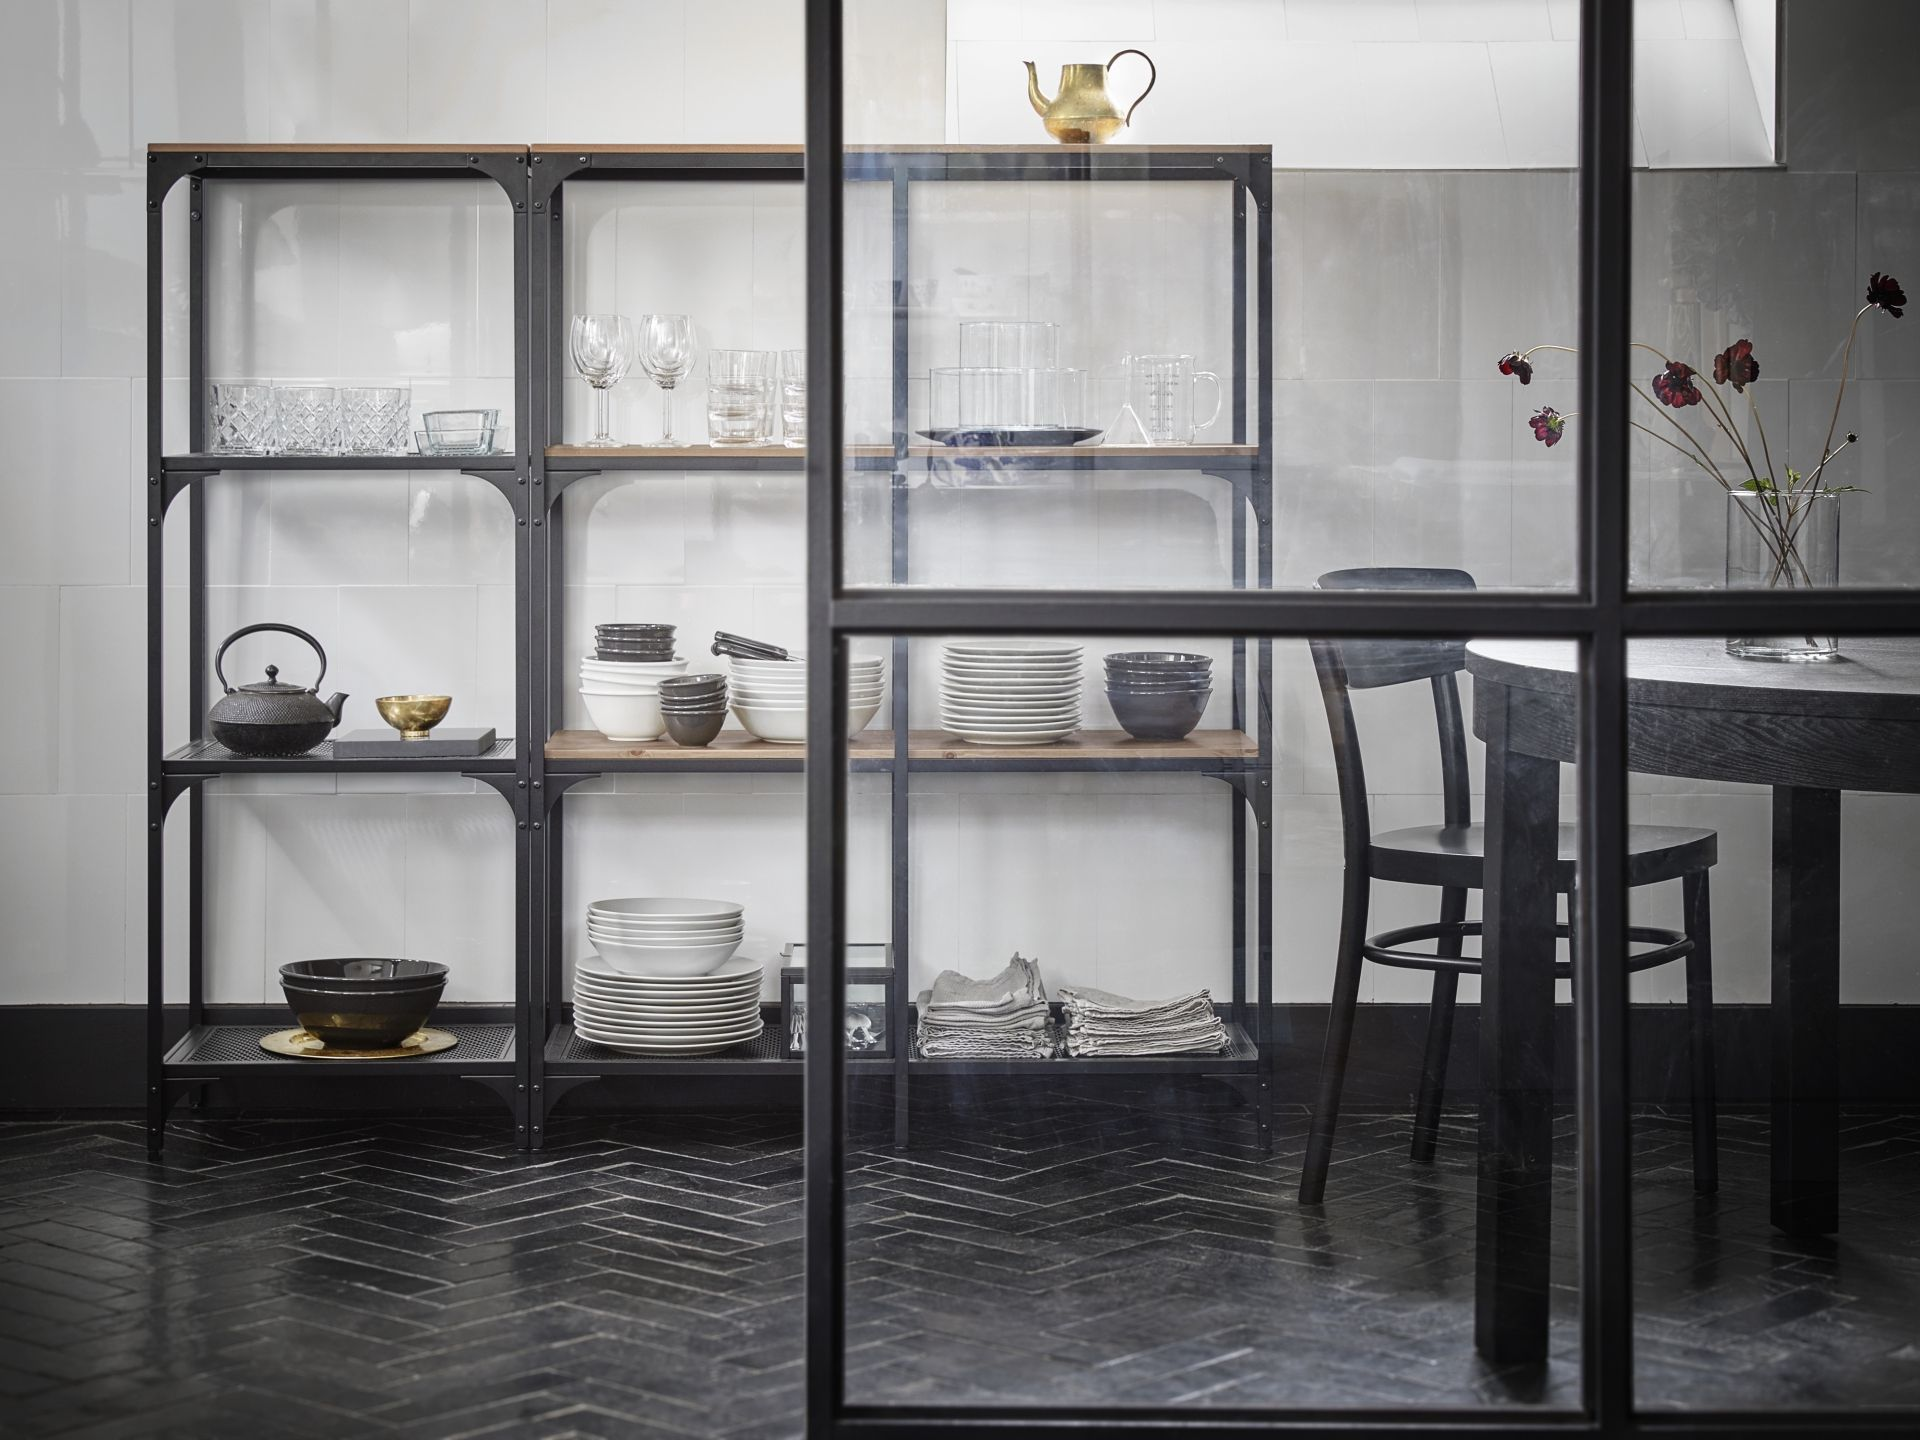 Design Kast Ikea : FjÄllbo collectie ikea ikeanederland ikeanl opbergen woonkamer